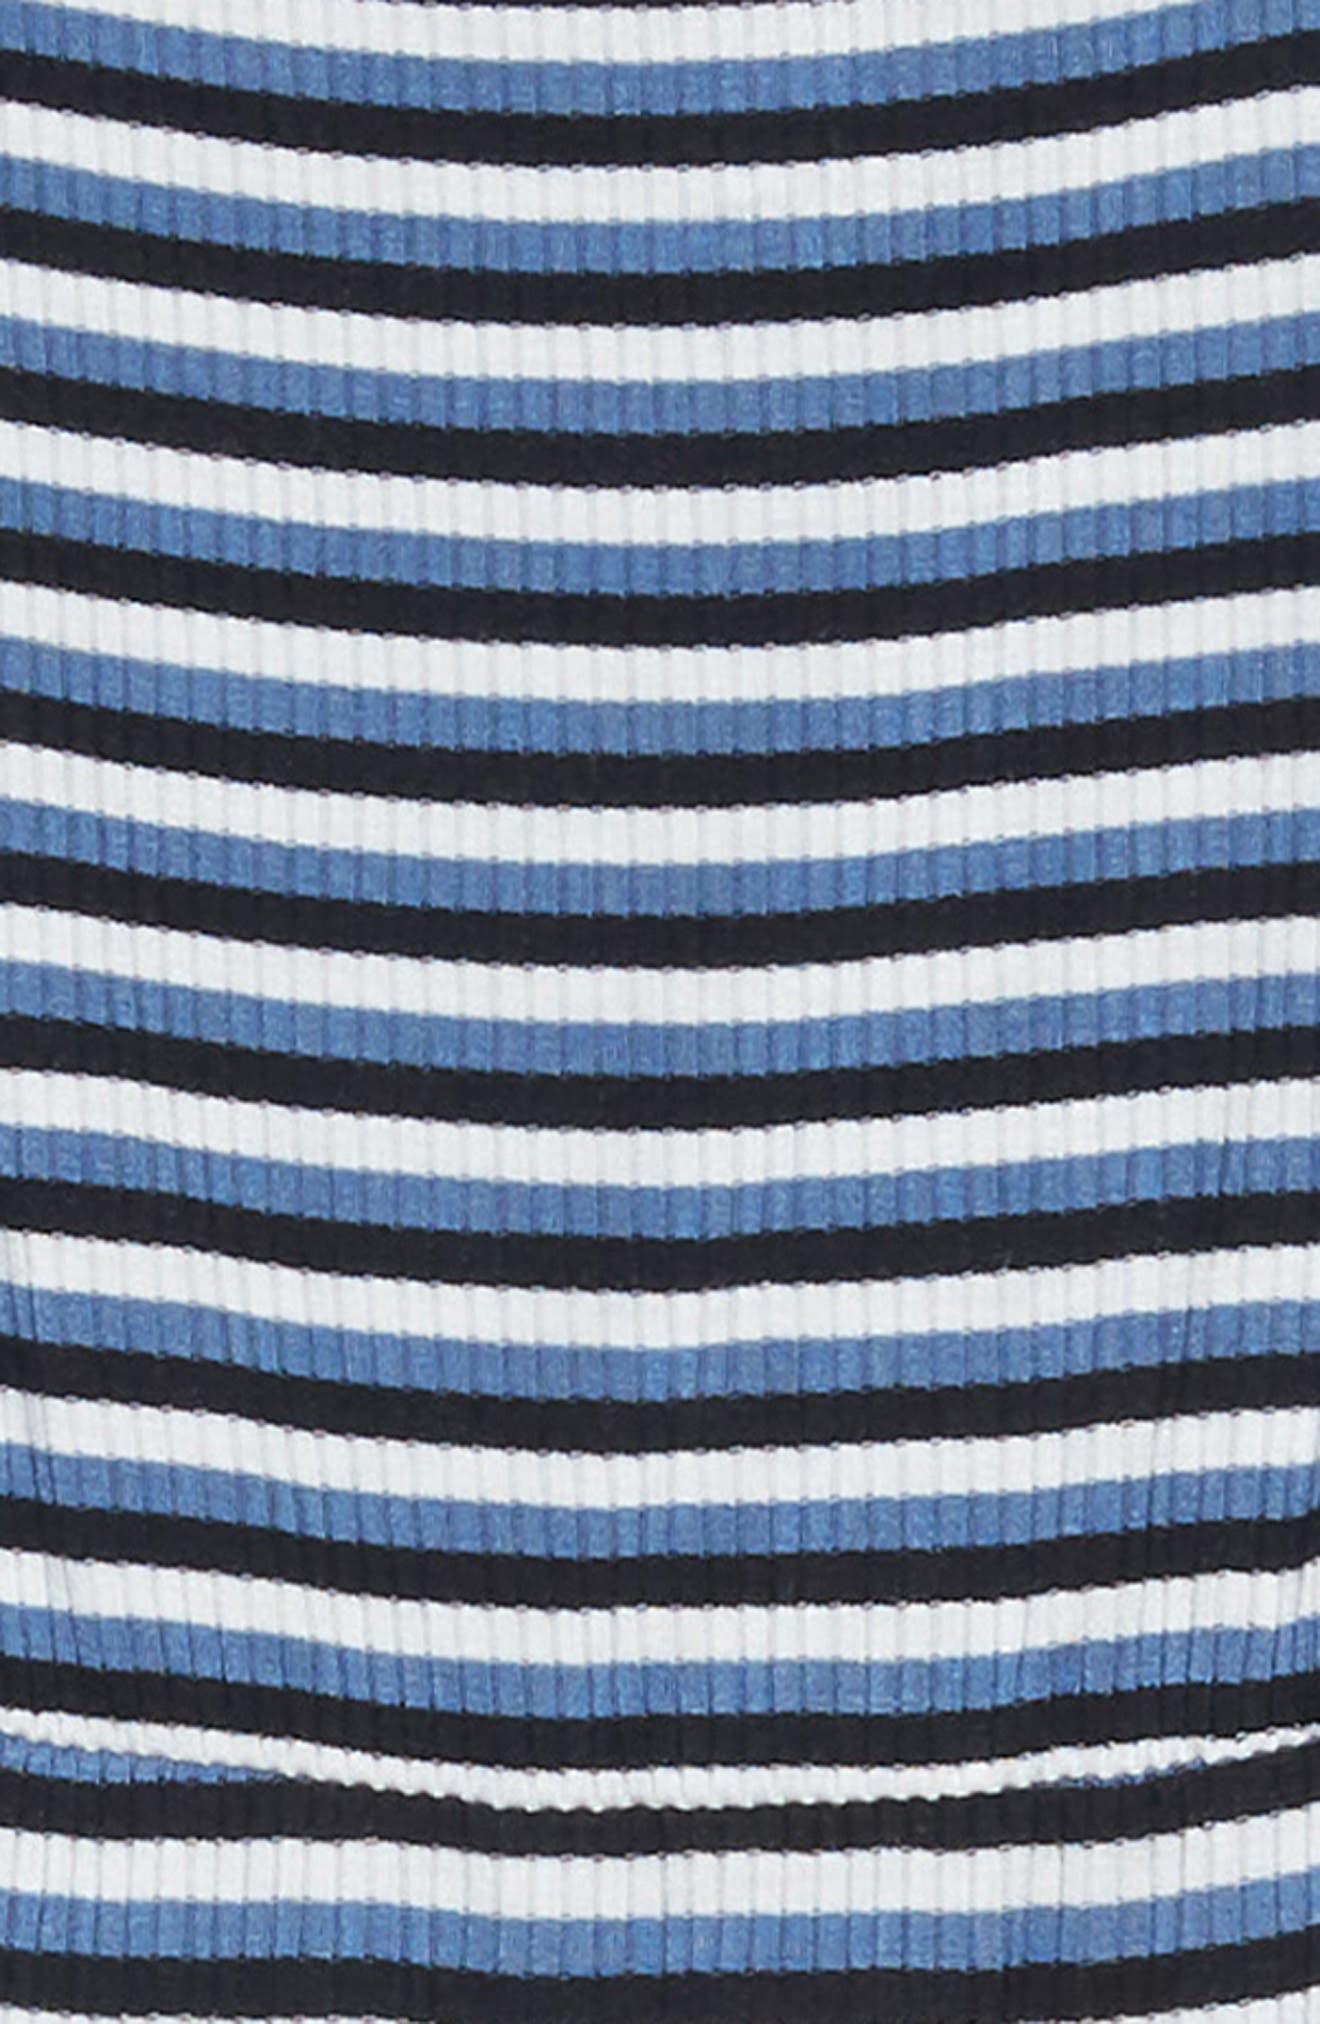 Square Neck A-Line Dress,                             Alternate thumbnail 3, color,                             NAVY